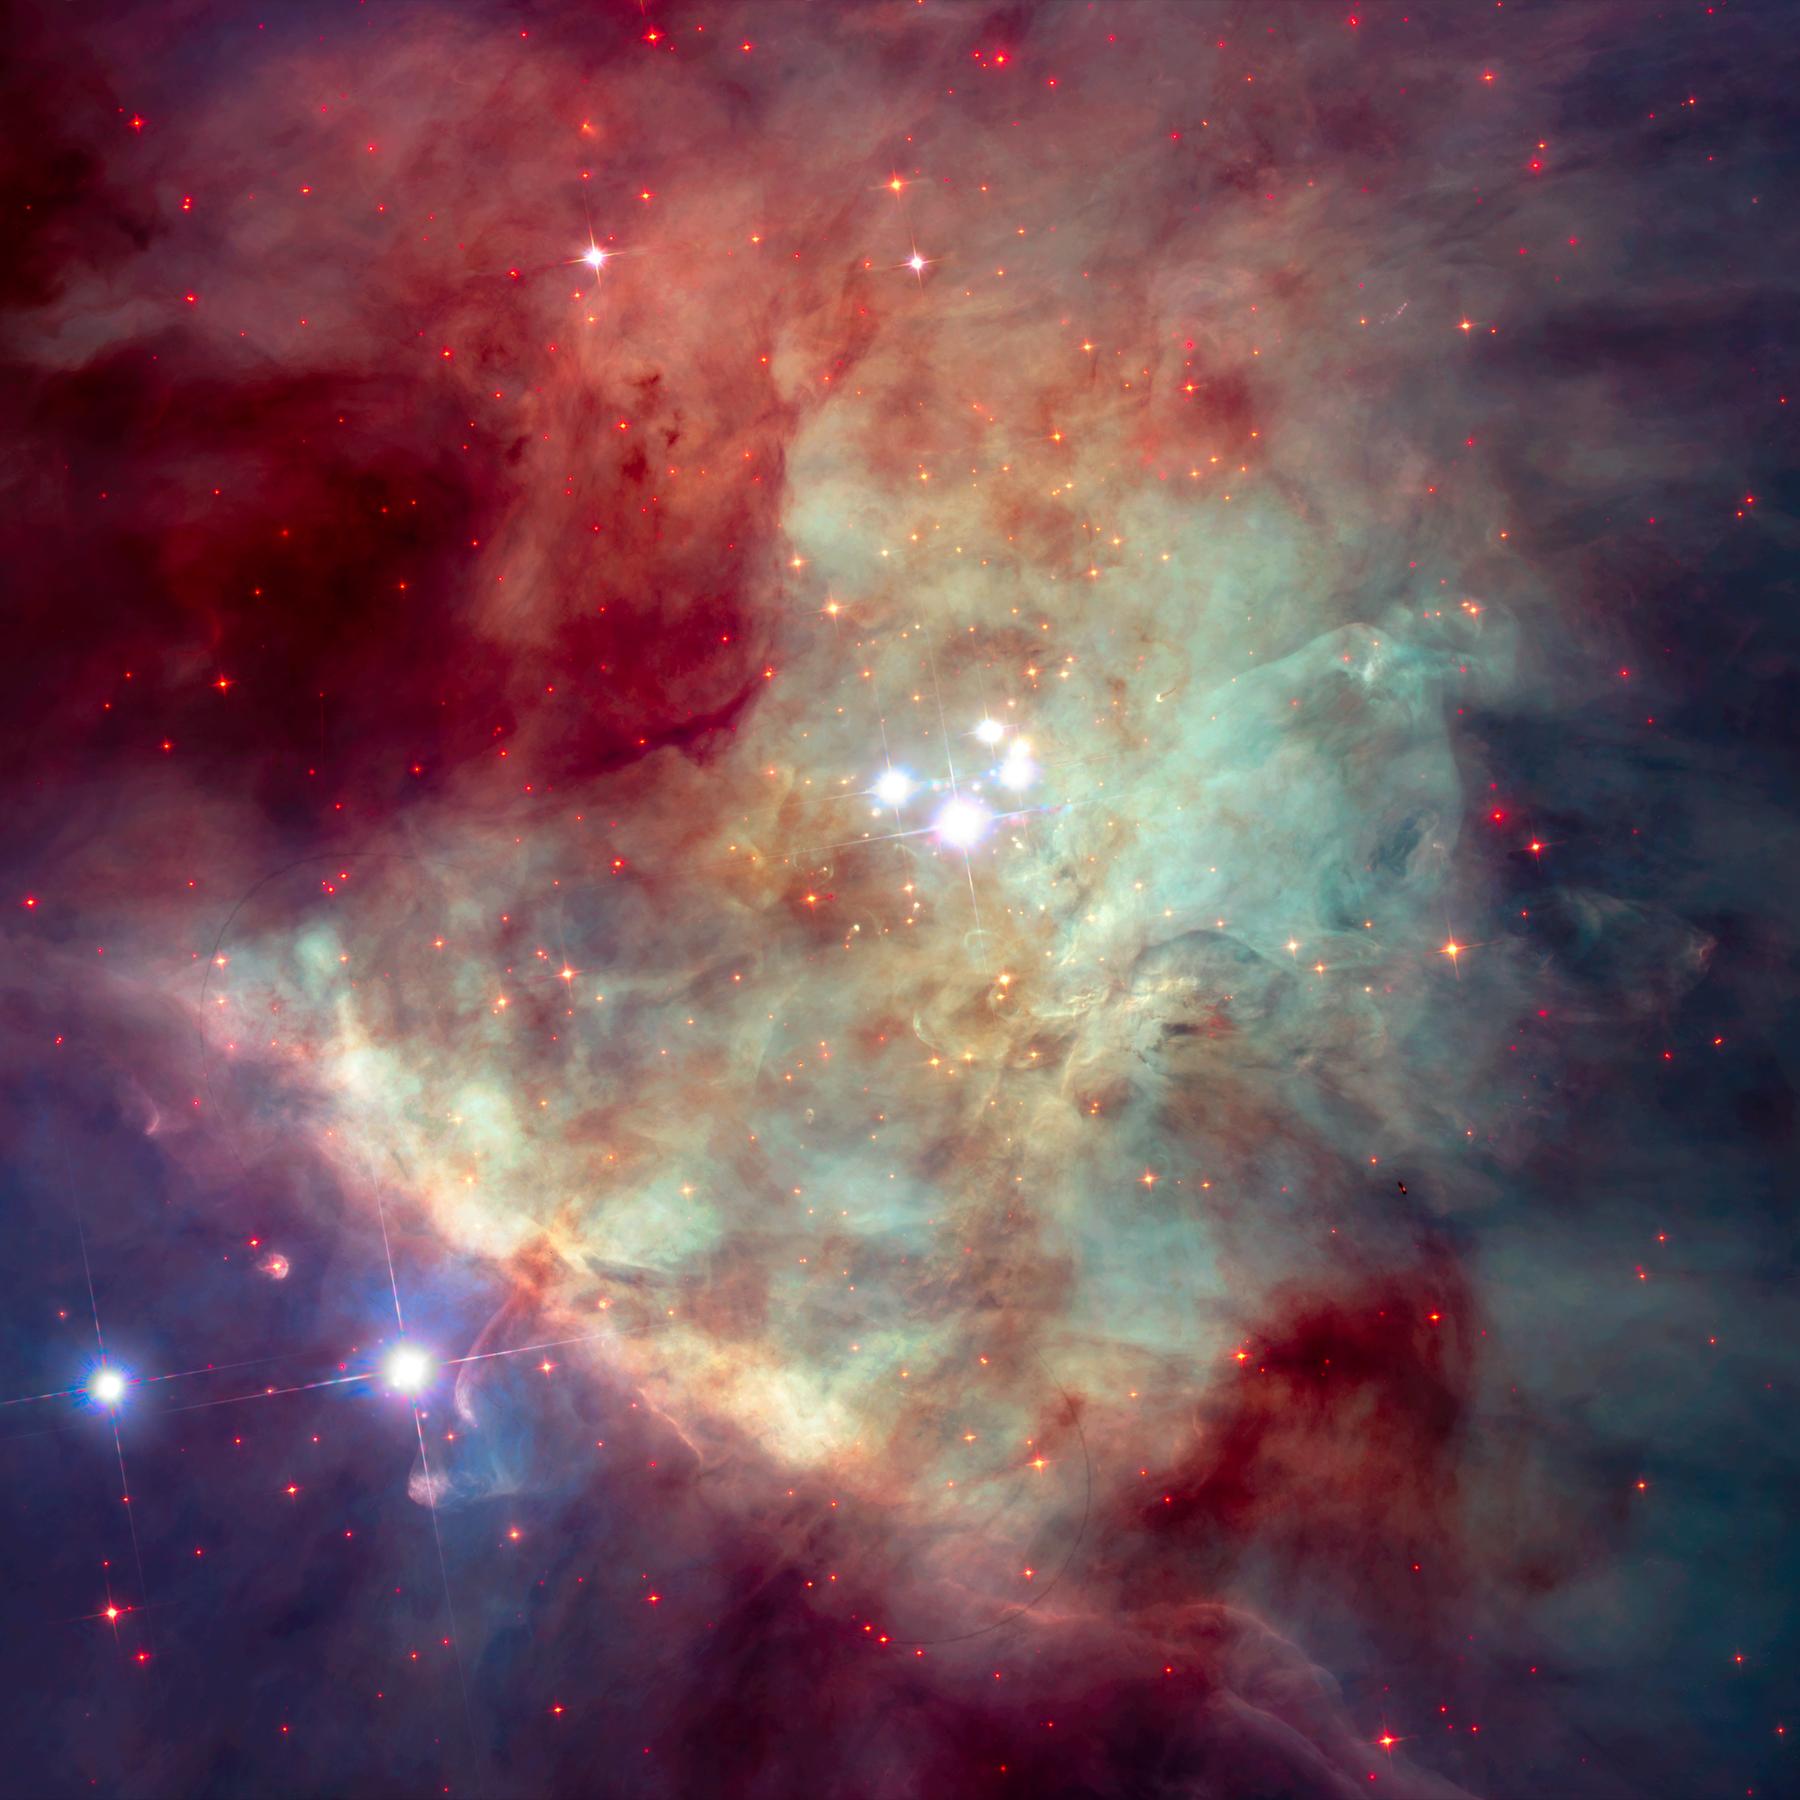 Webb to Study How Stars' Blasts of Radiation Influence Environments